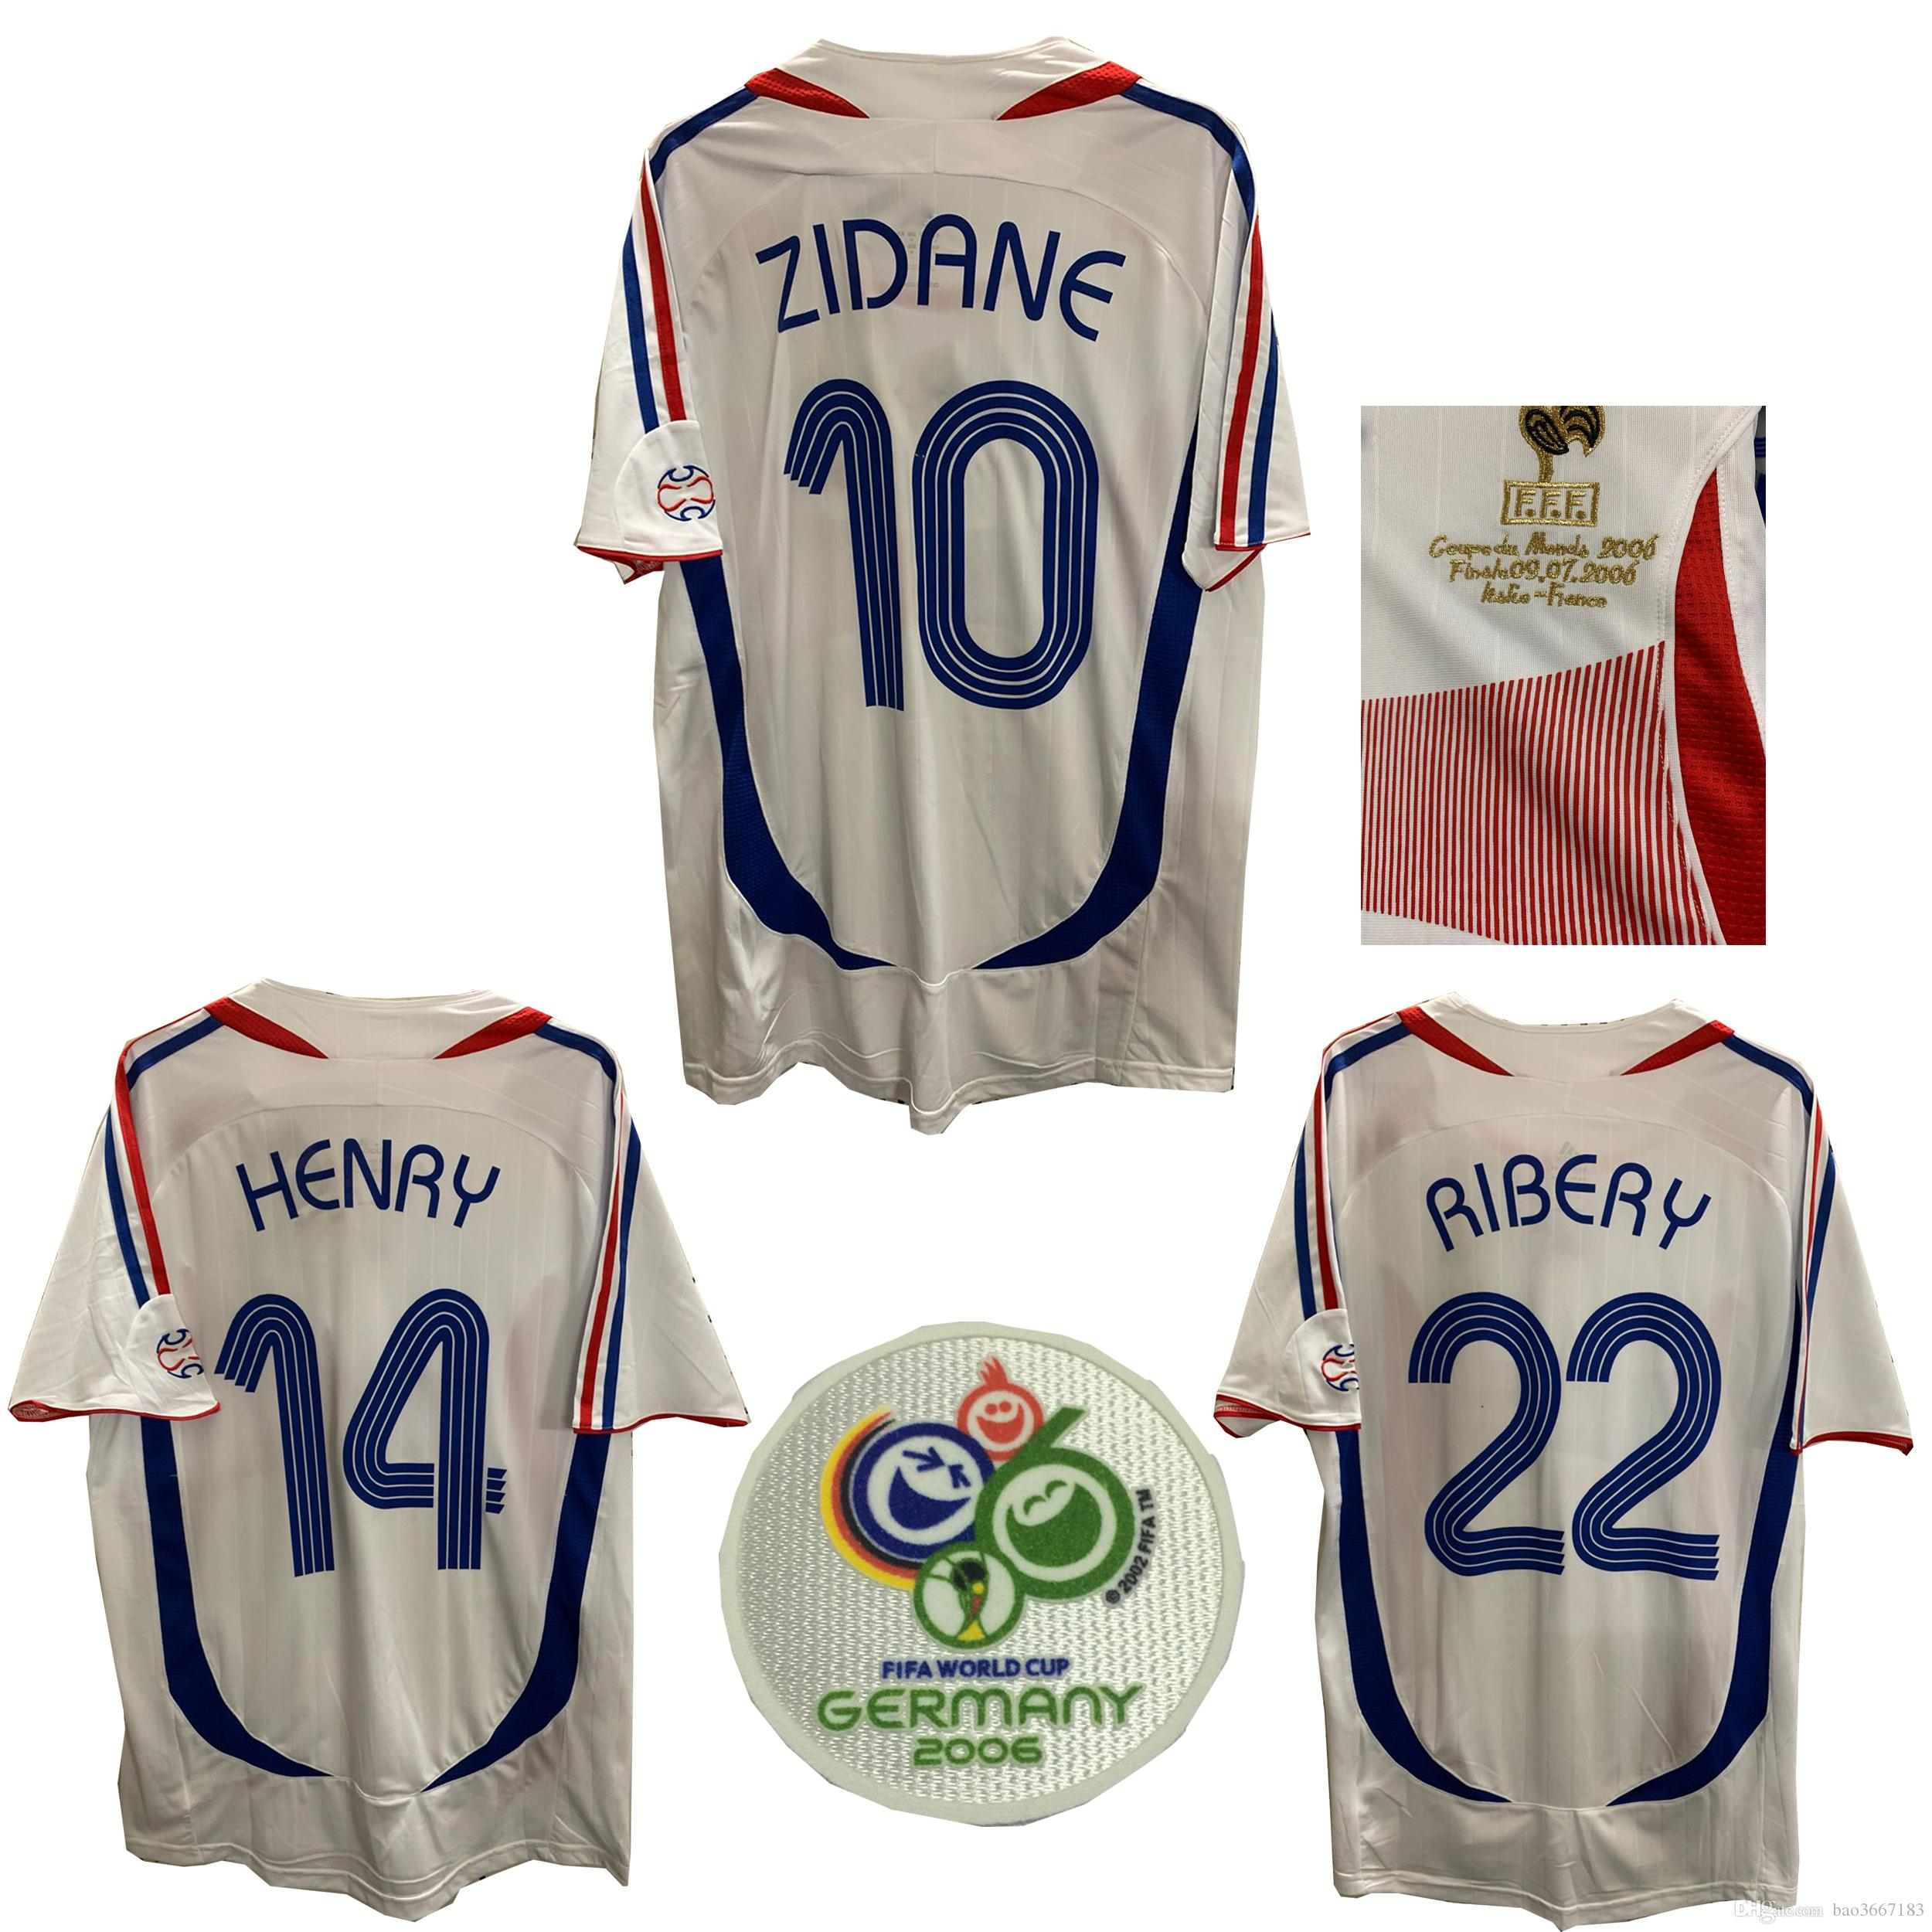 2019 2006 World Cu FRANCE Retro Soccer Jerseys Zidane MALOUDA Henry RIBERY  VIEIRA TREZEGUET MBAPPE GRIEZMANN KANET FRANCE Retro Football Shirts From  ... fdfa2f54c